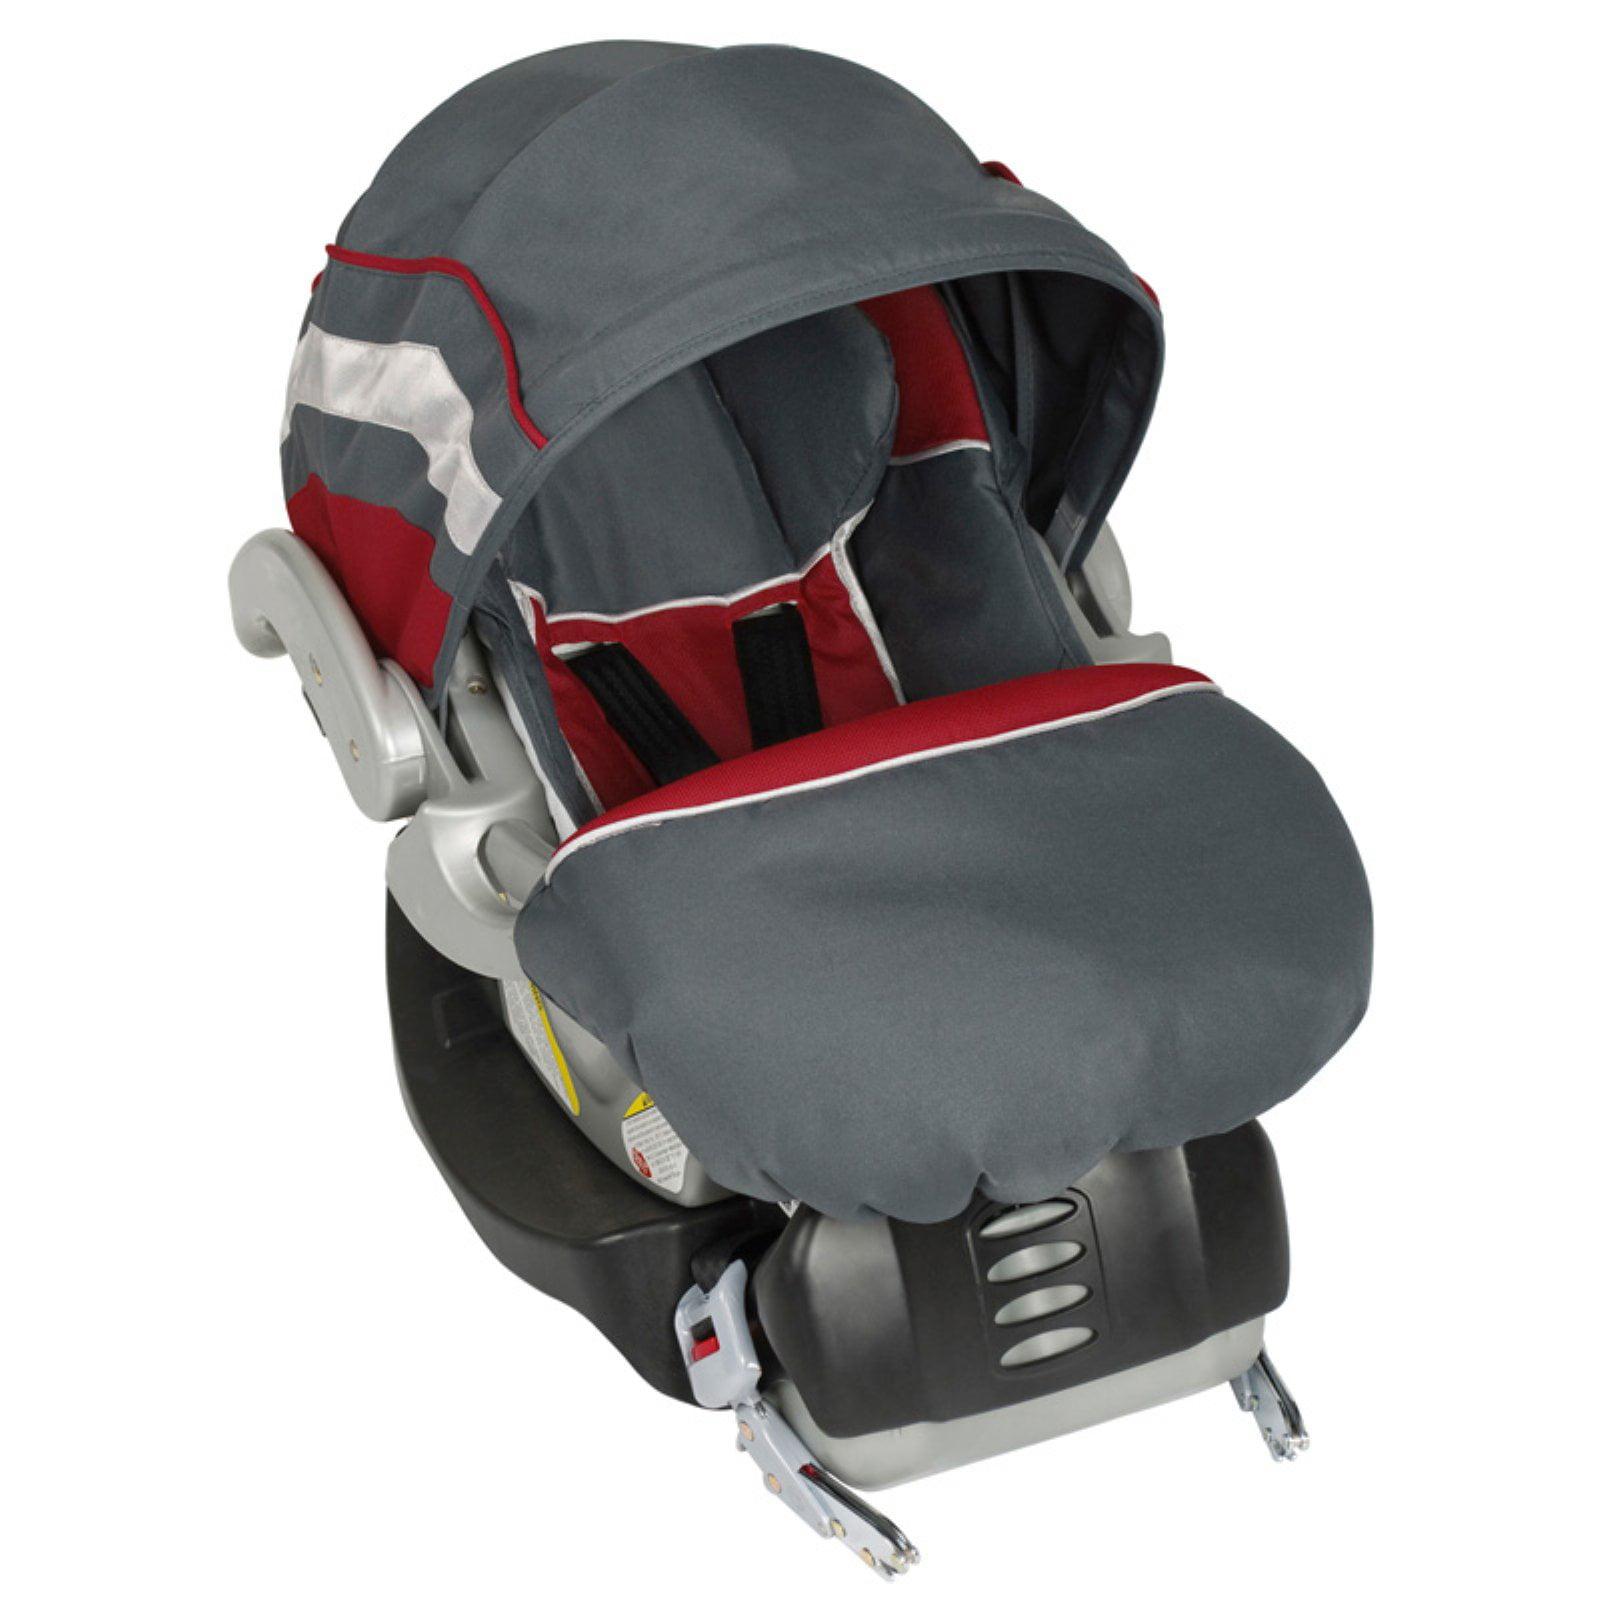 Baby Trend Flex Loc Infant Car Seat - Baltic